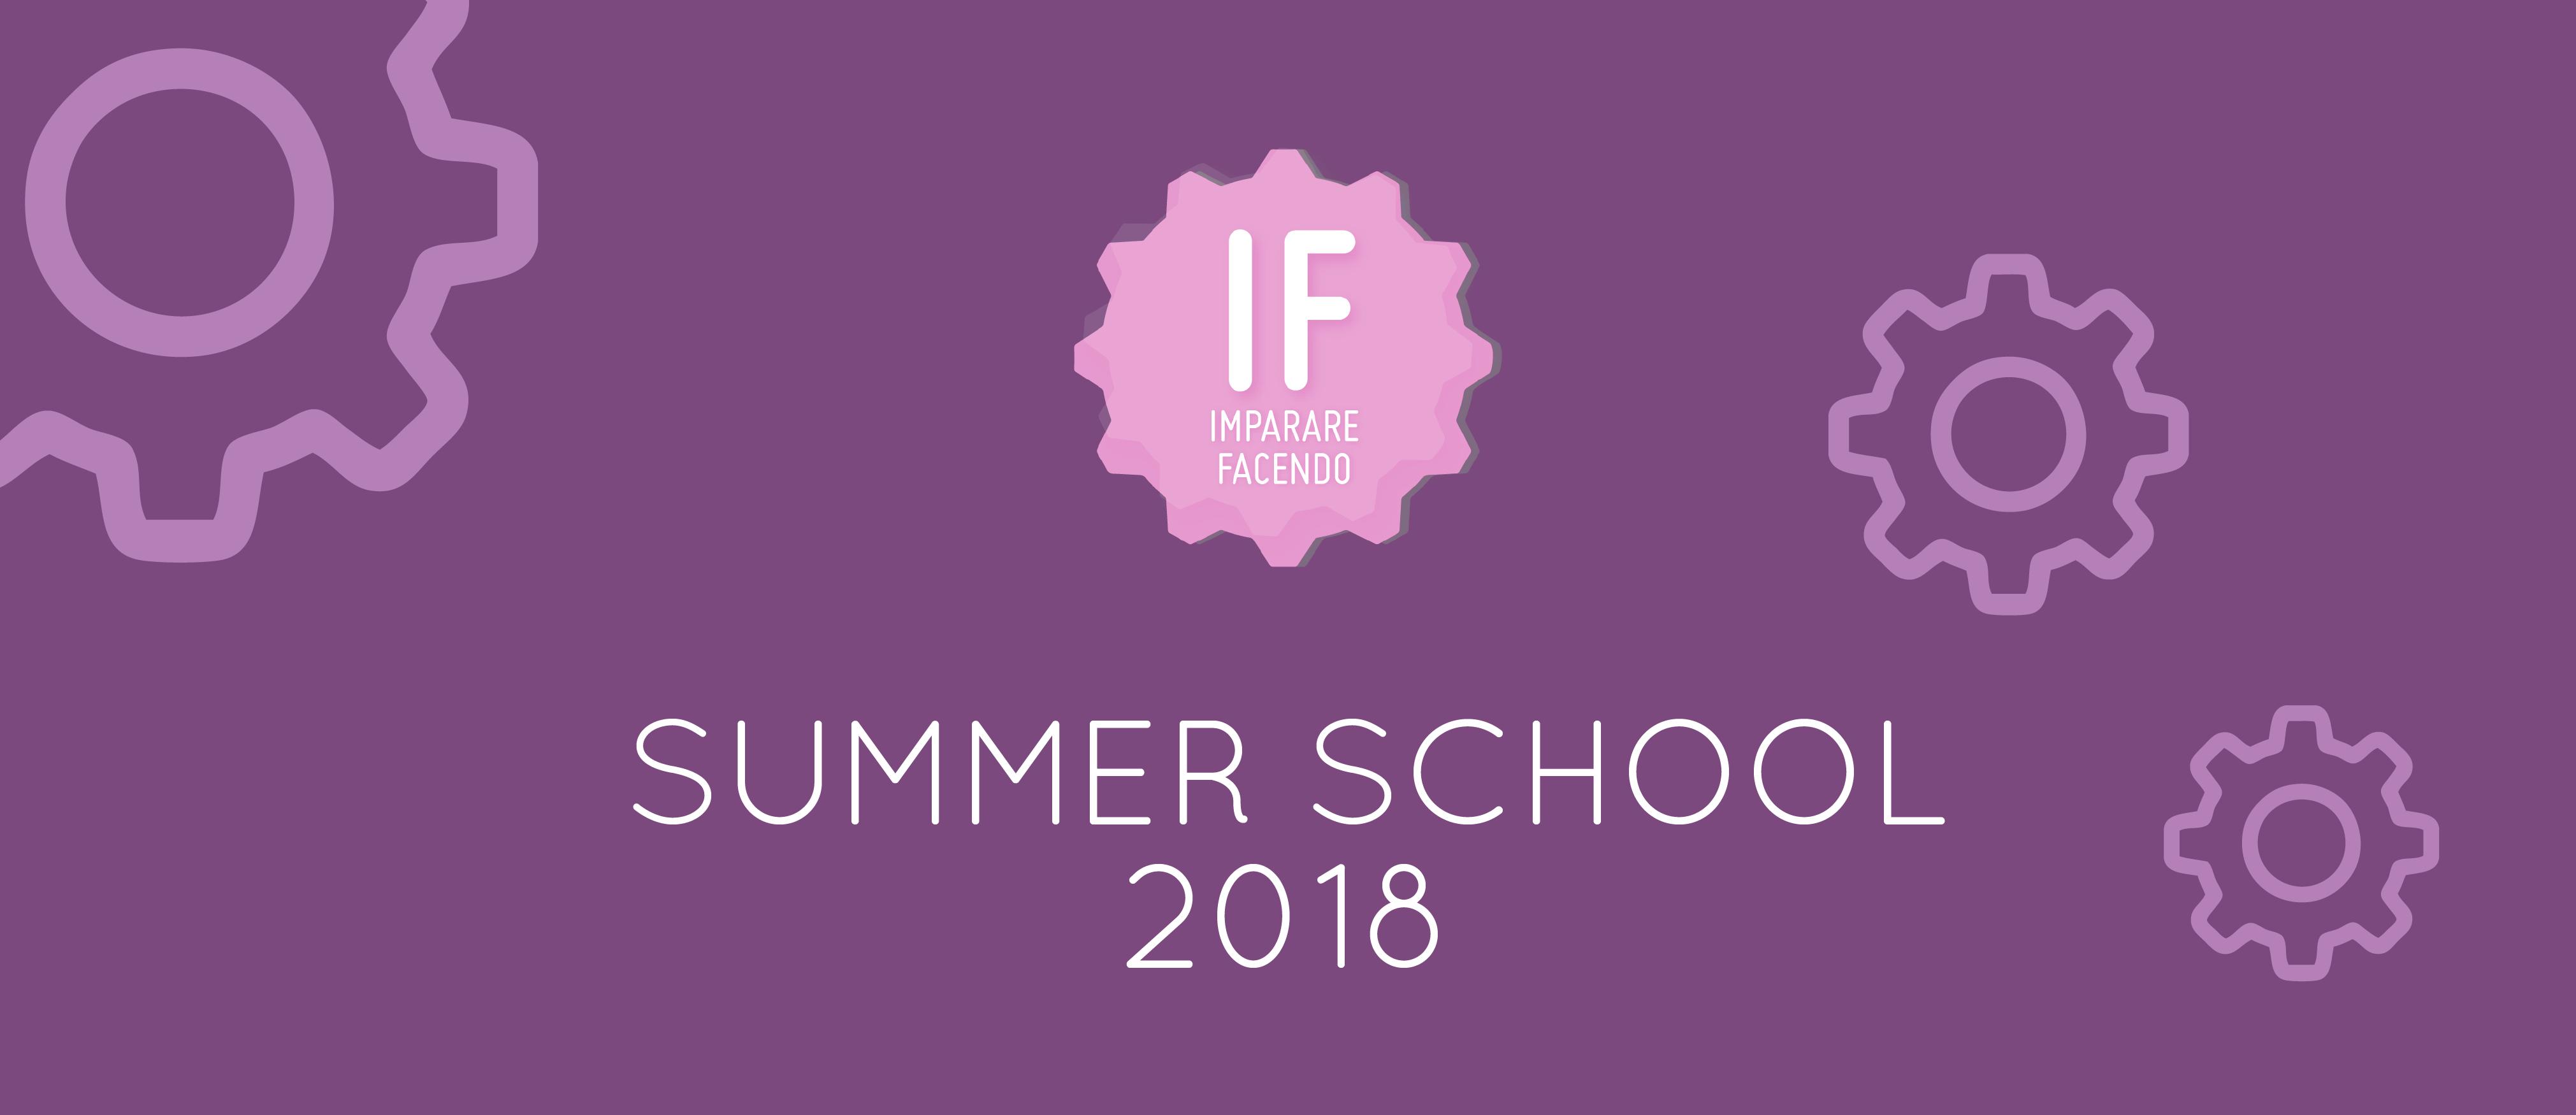 IF – Summer School 2018